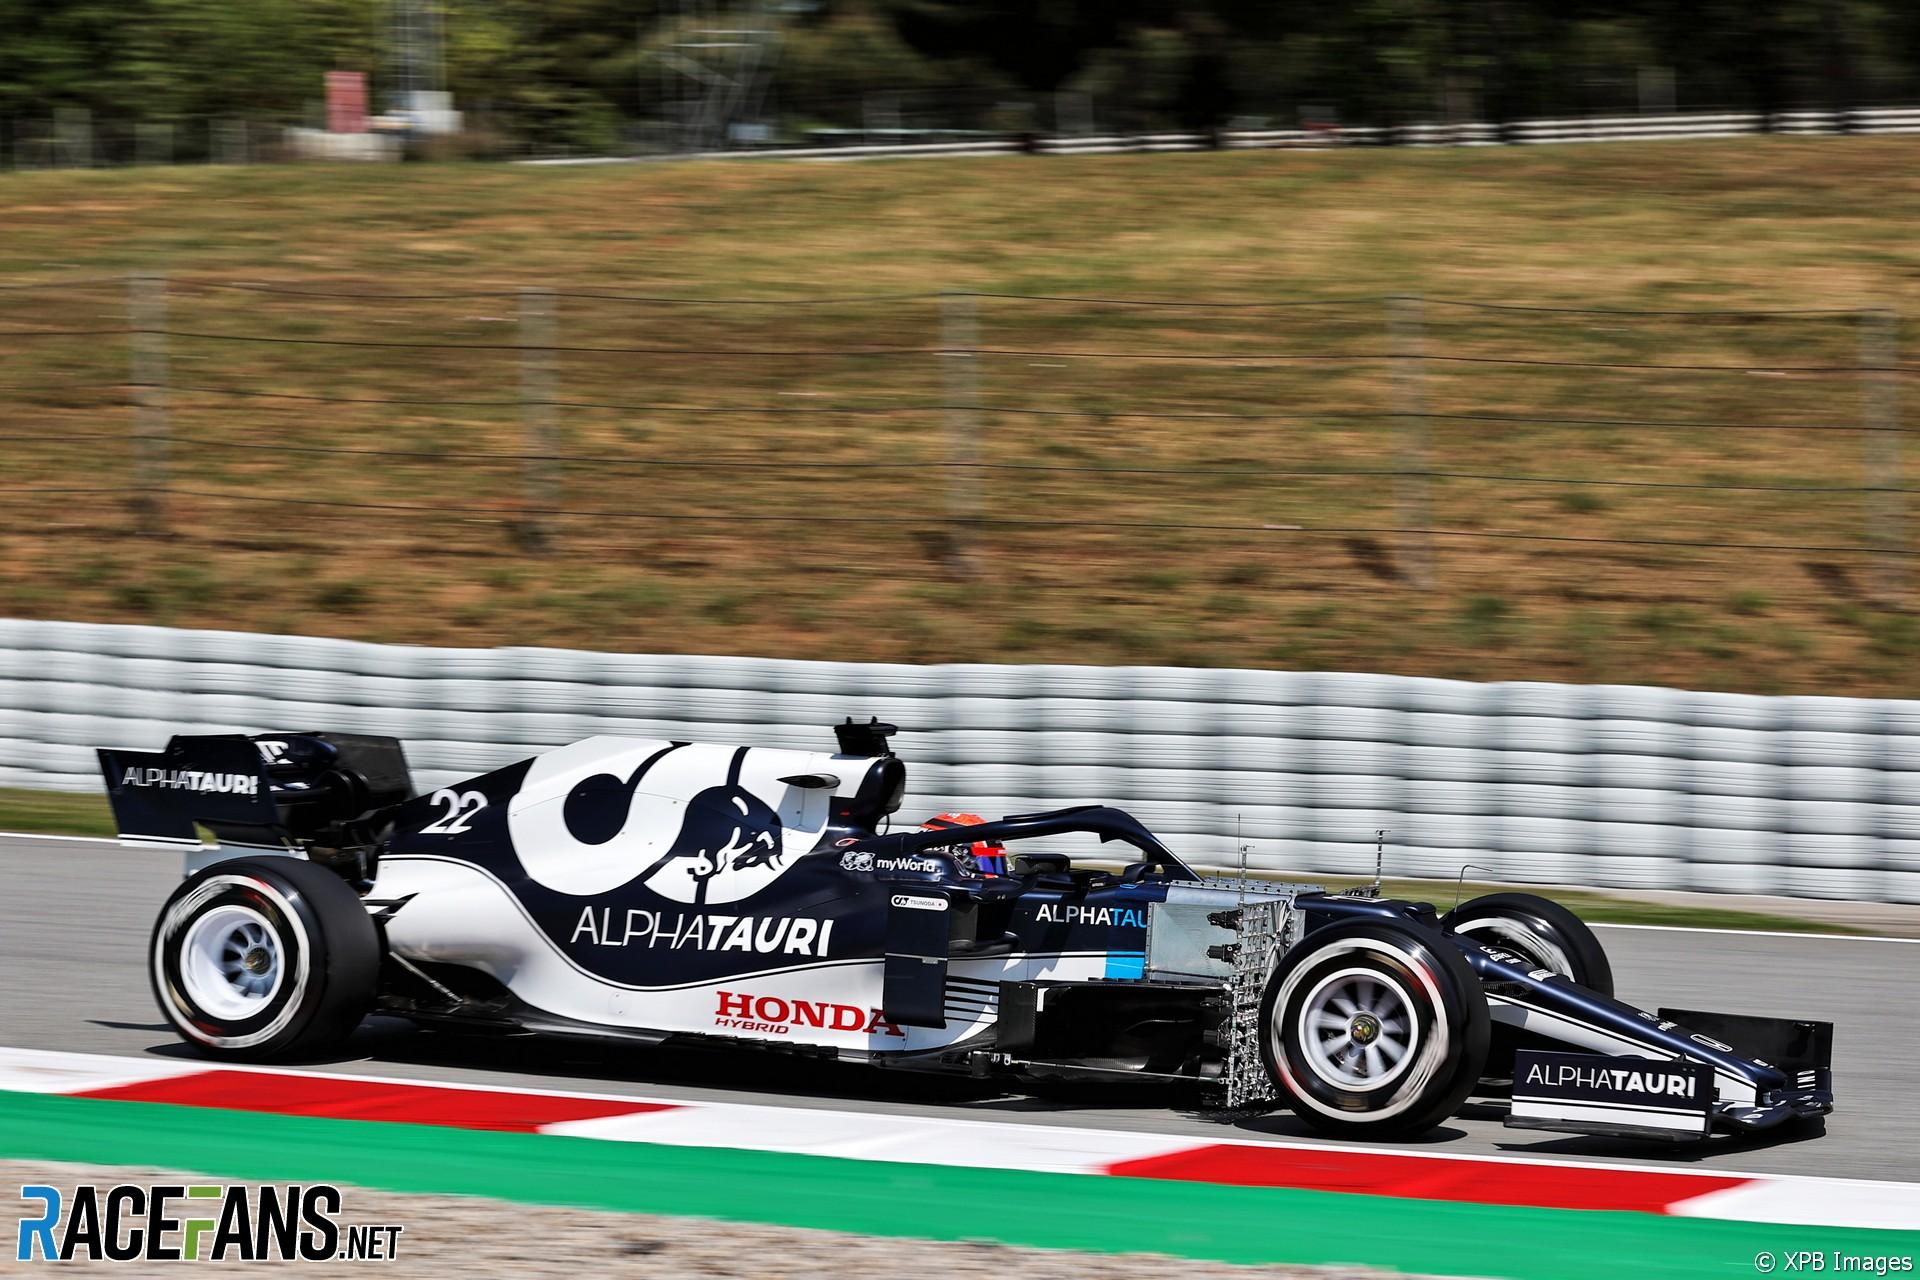 Yuki Tsunoda, AlphaTauri, Circuit de Catalunya, 2021